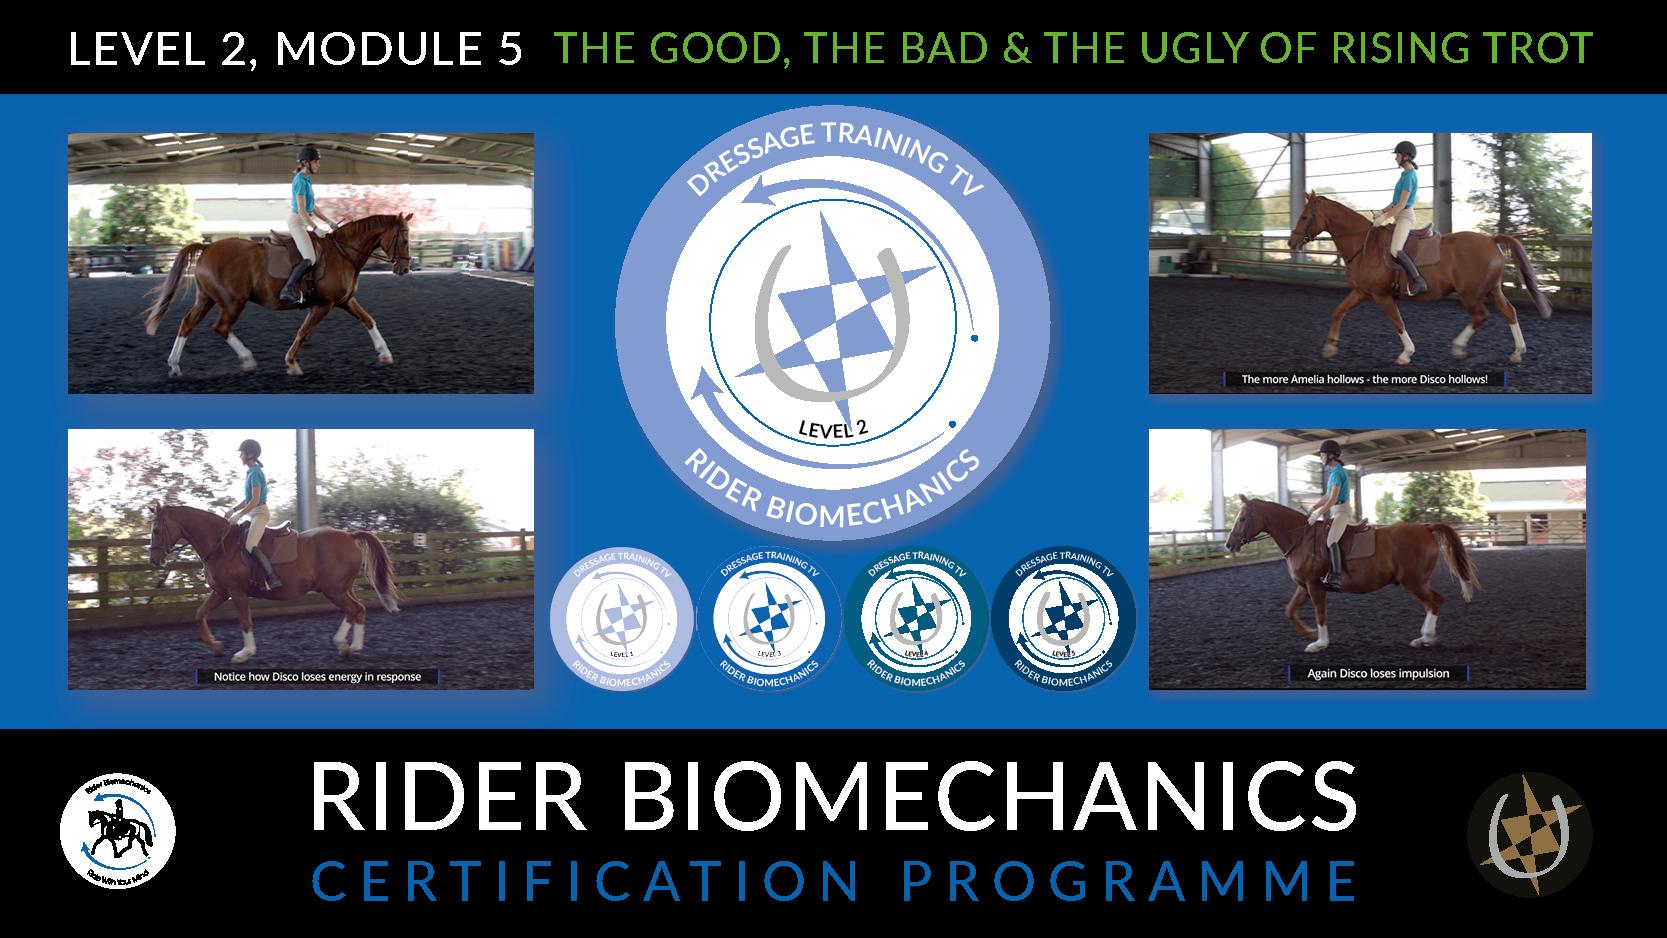 Rider Biomechanics Certification Programme